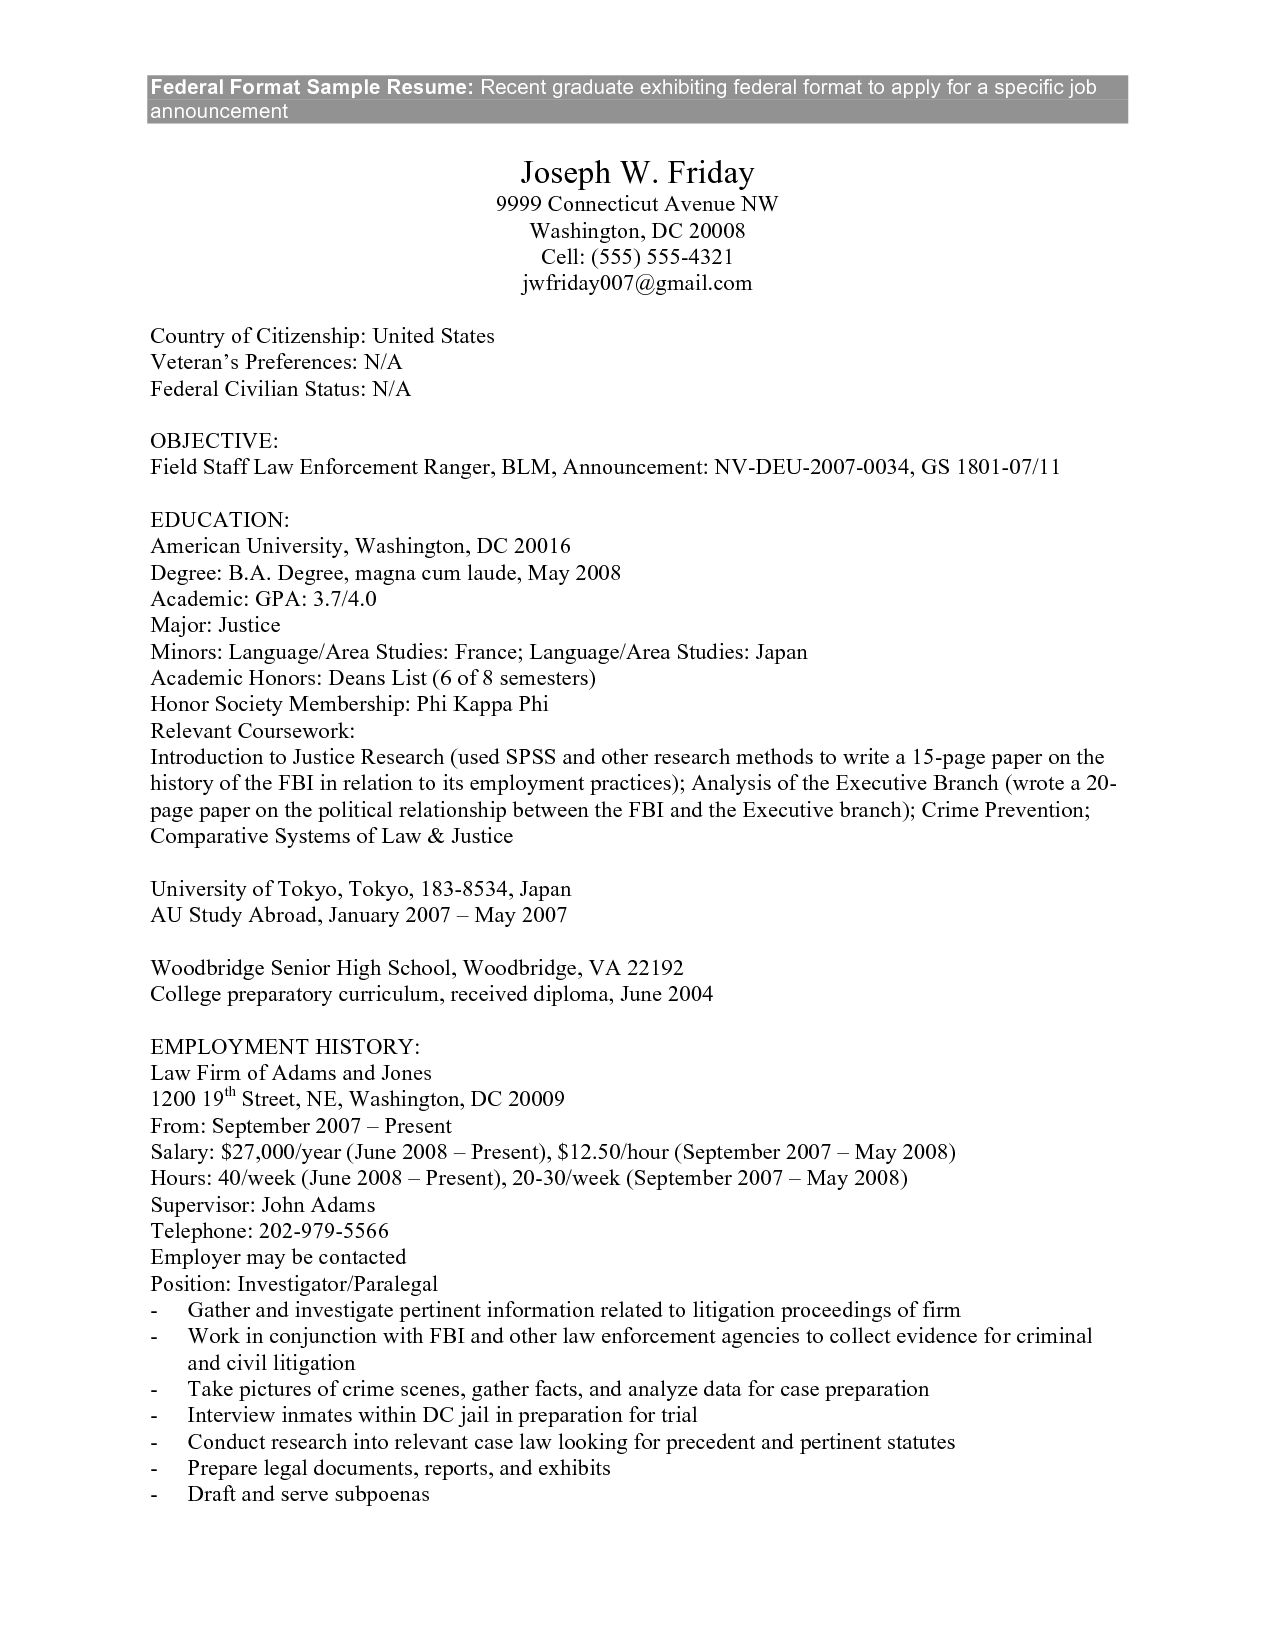 examples resumes resume for internal job posting gogetresume